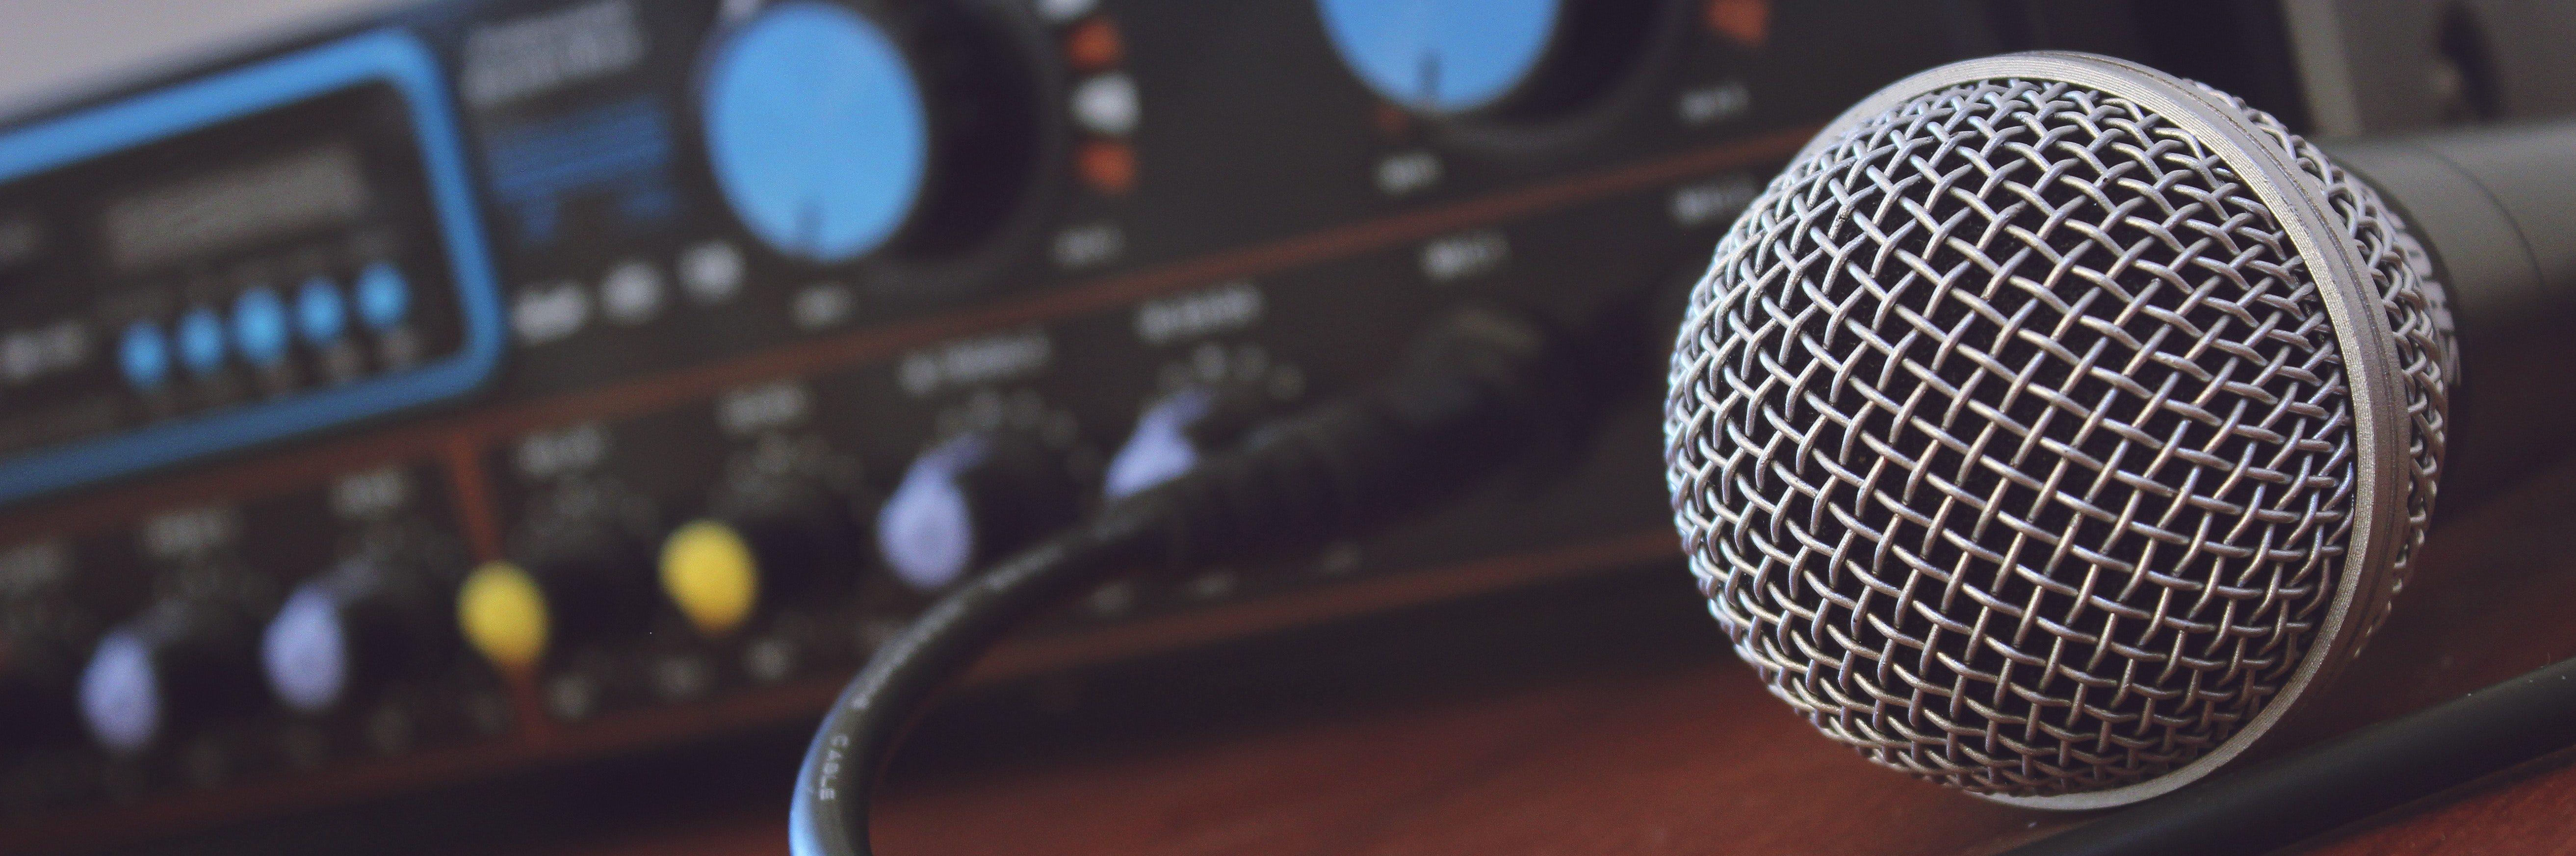 audio-visual microphone